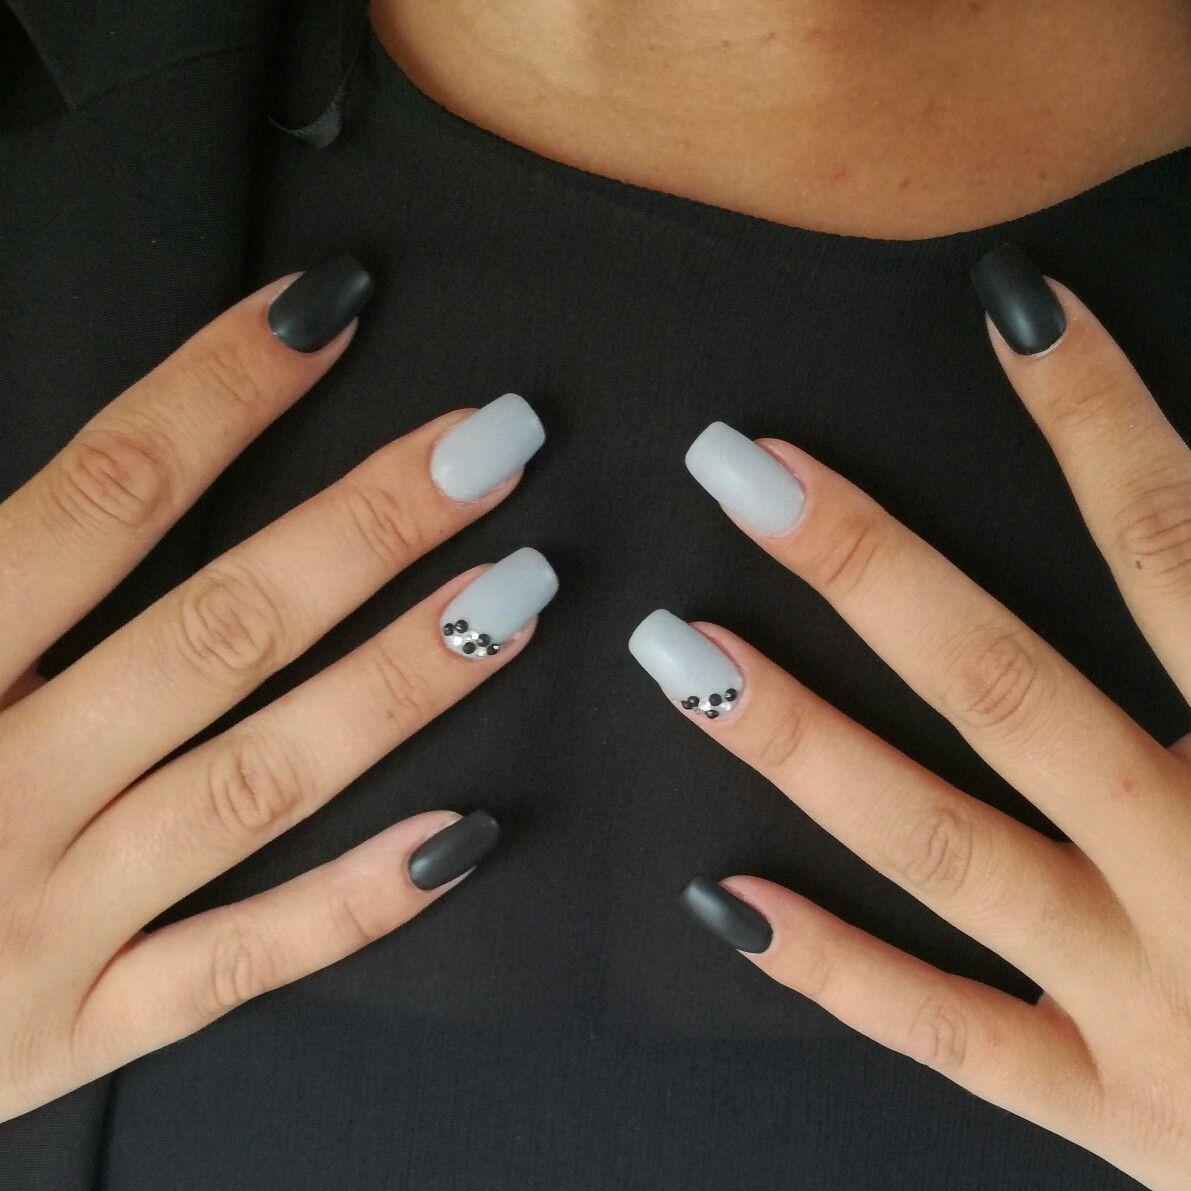 Ongles en gel noir et gris mat Nails black and grey